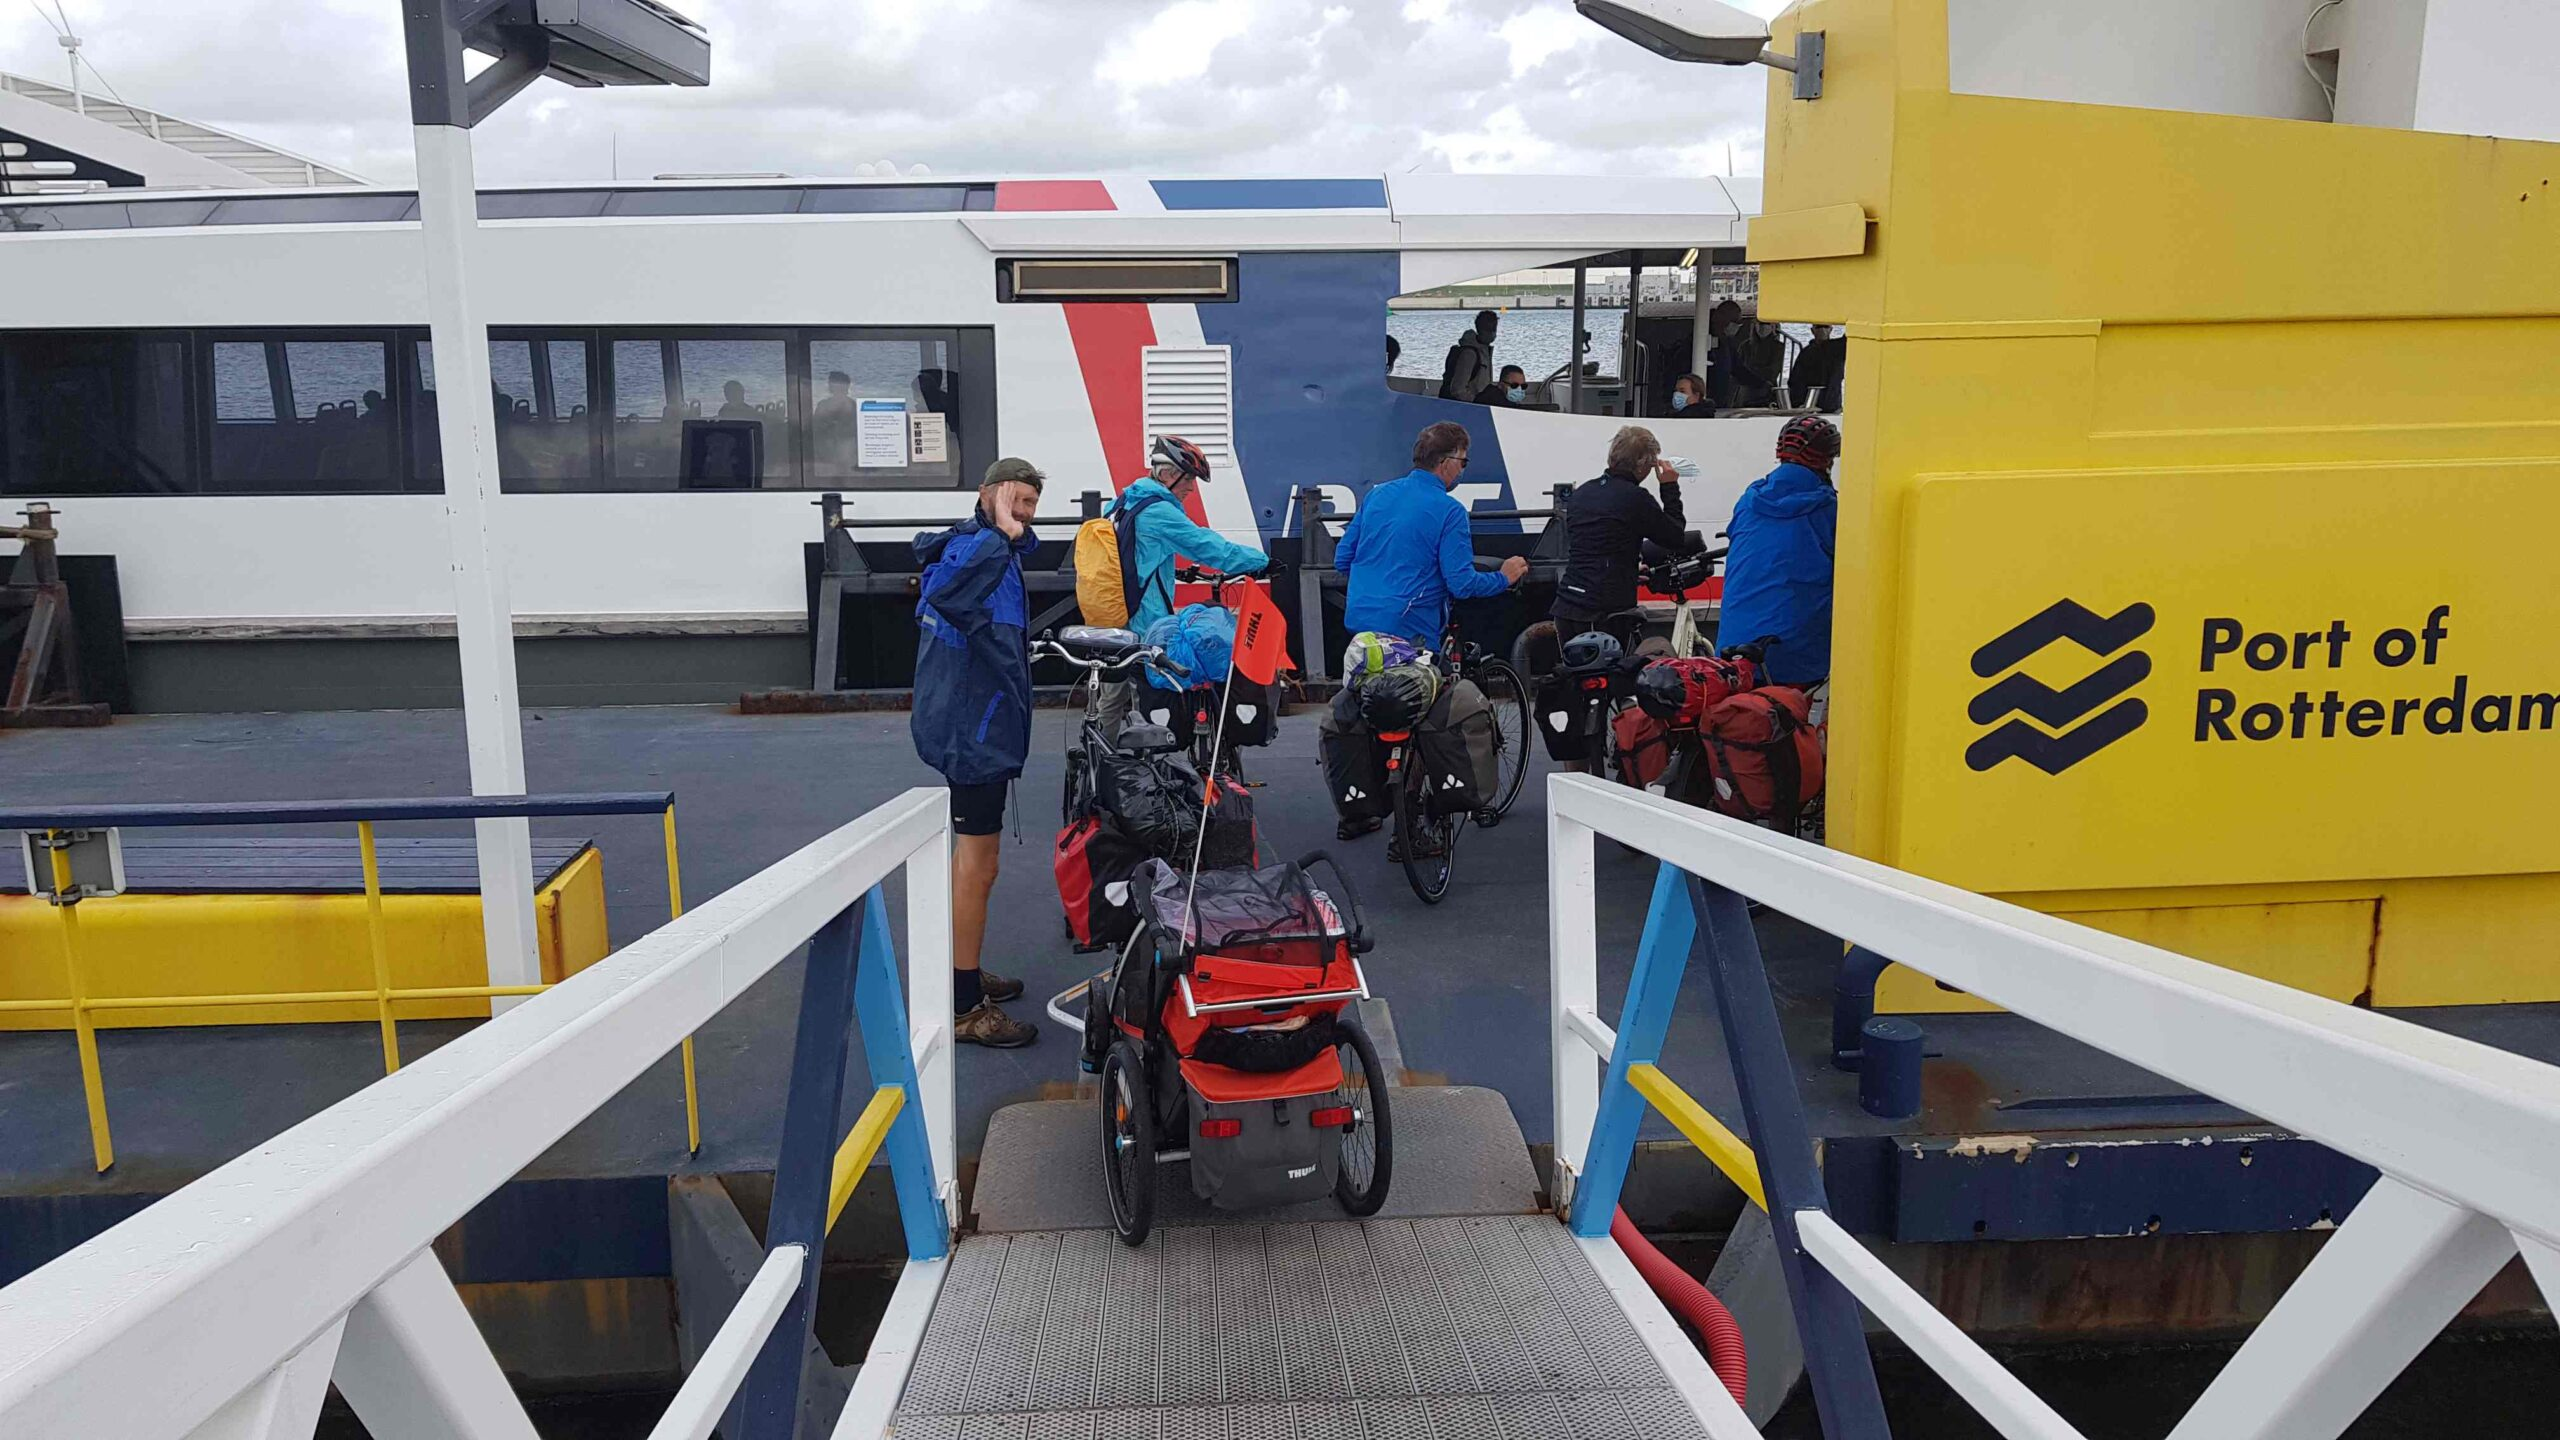 Rondje-Nederland-met-baby-ferry-Rotterdam